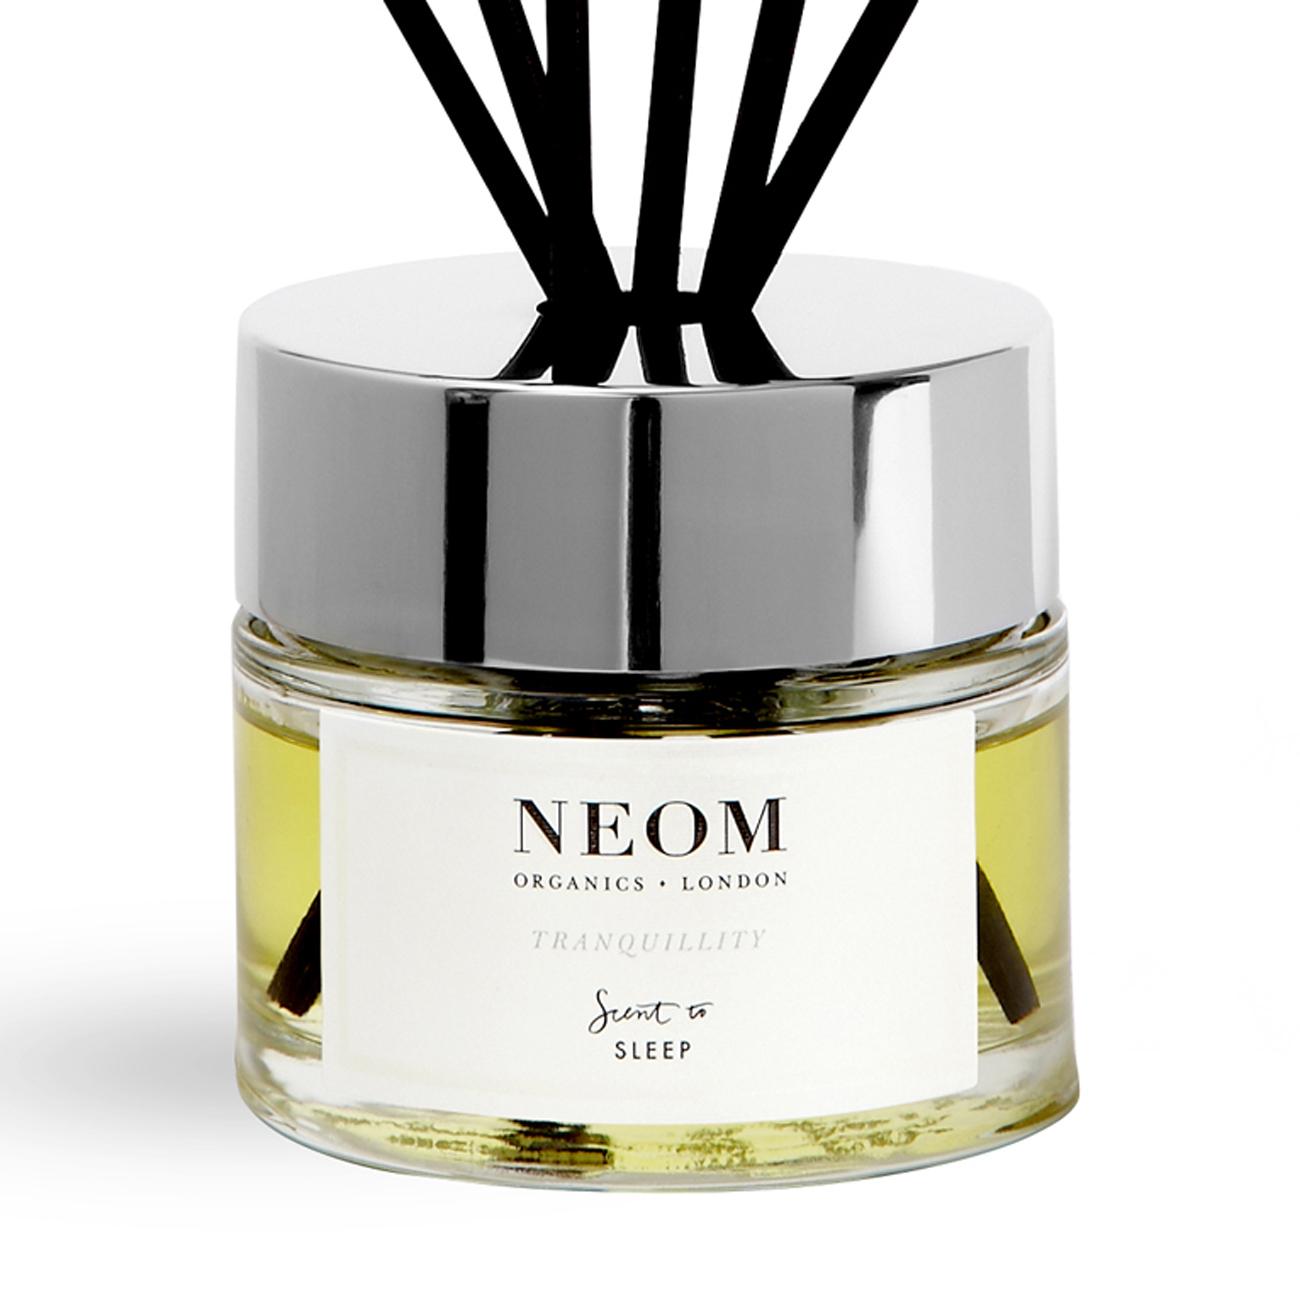 Neom Organics London Tranquillity Reed Diffuser